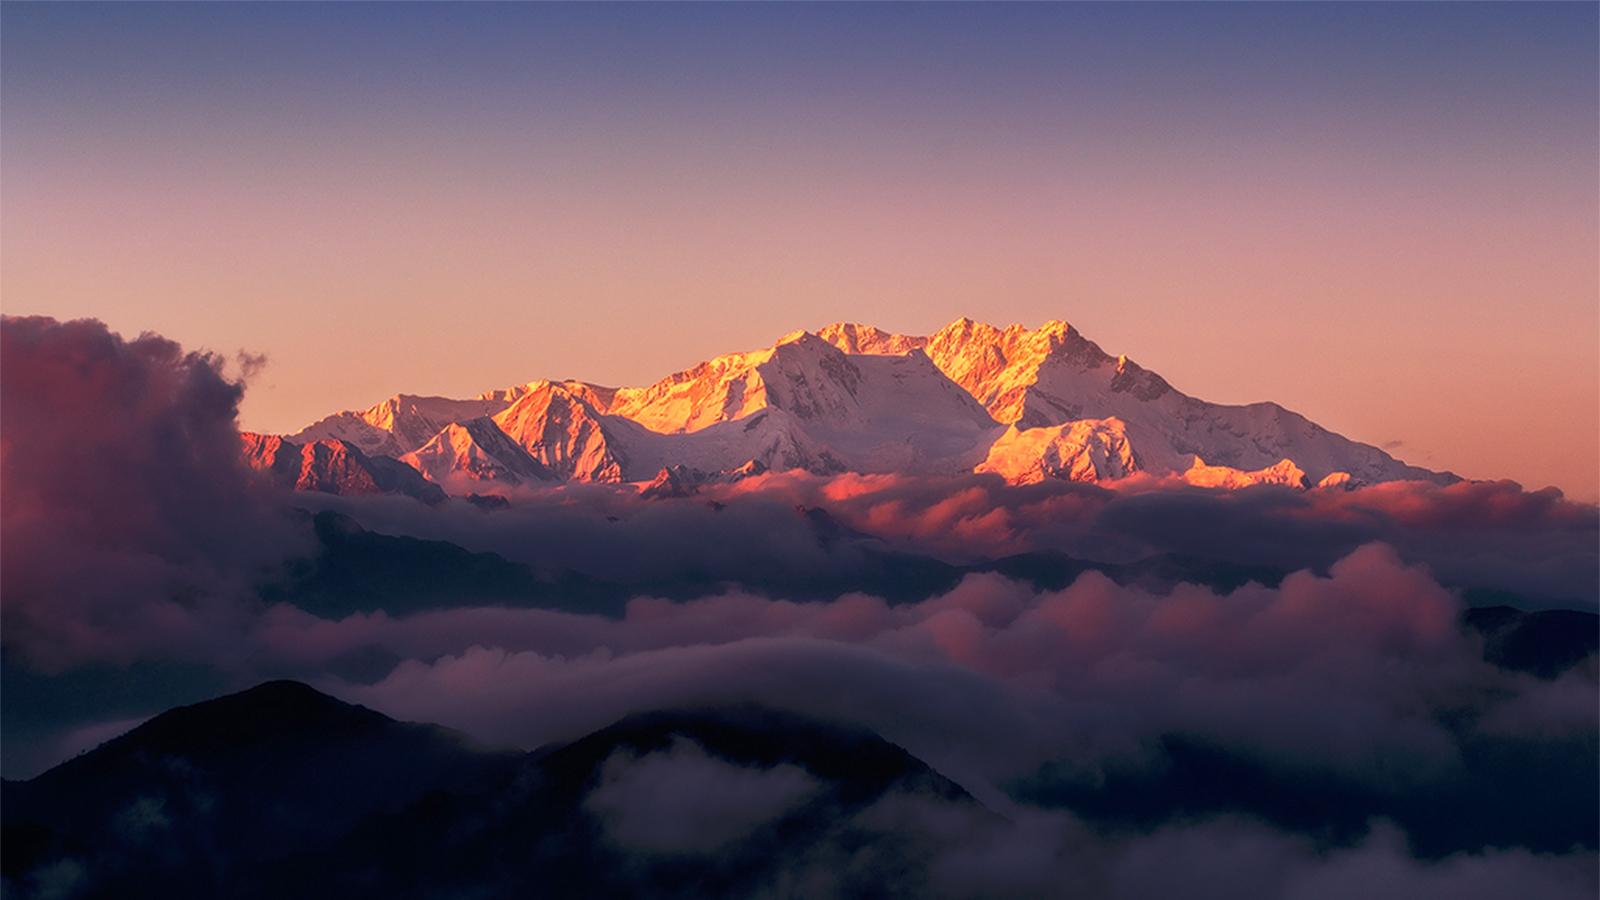 Le Kangchenjunga au-dessus des nuages, en Inde - © Subhadip Choudhury